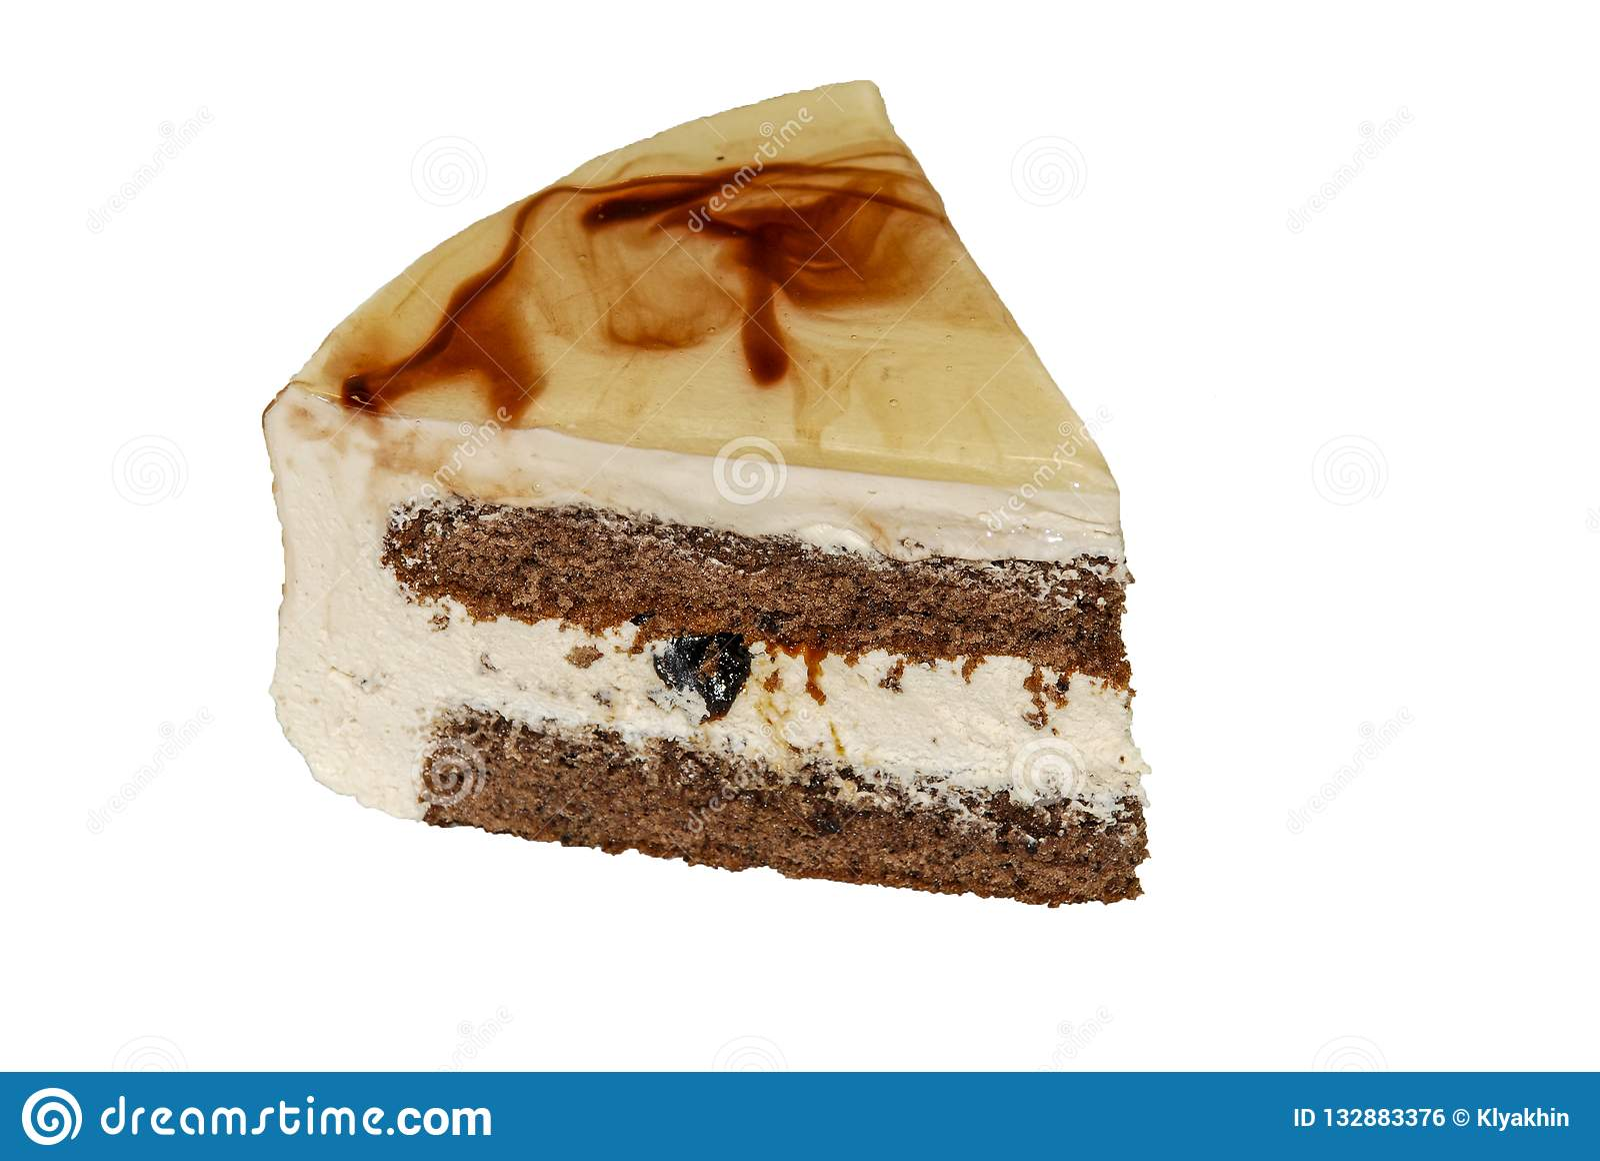 Stuk van cake met room en gedroogde pruimen